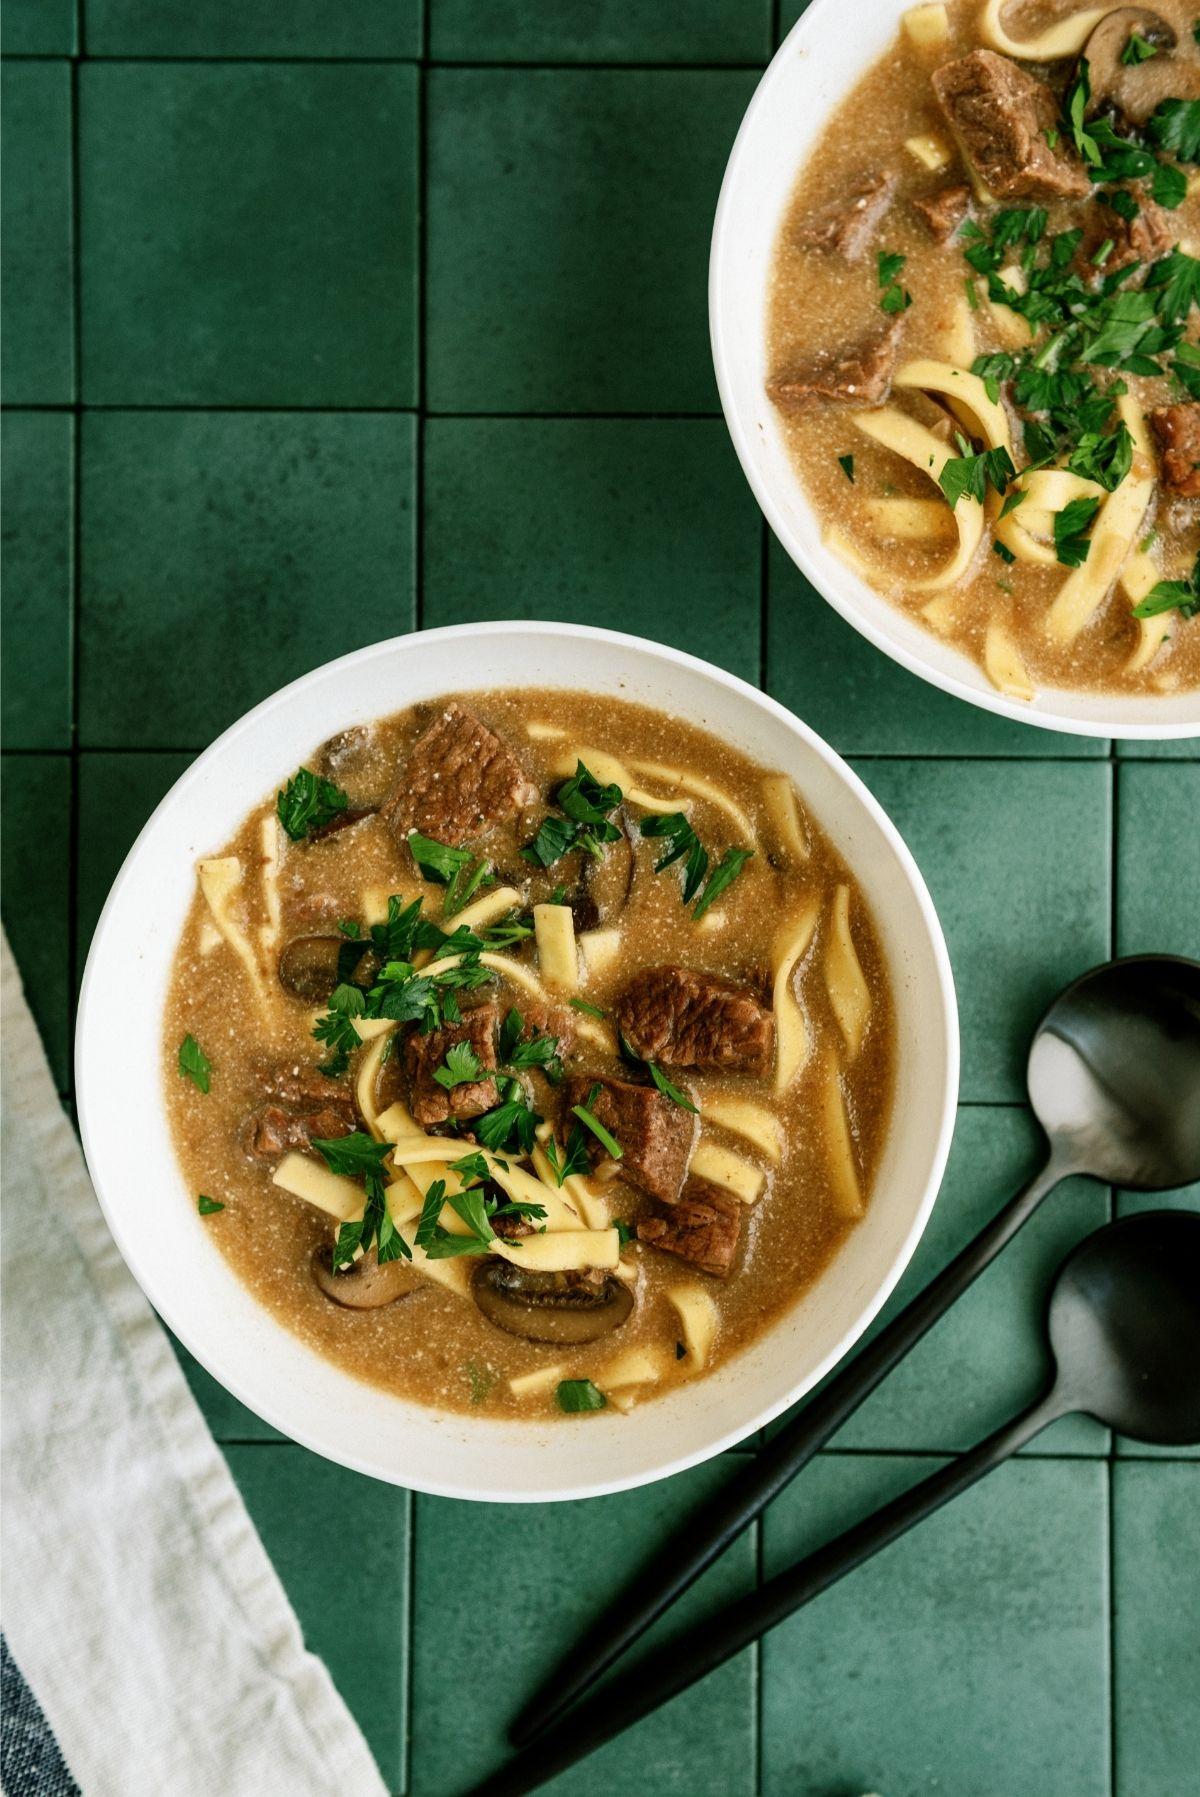 2 Bowls of Instant Pot Beef Stroganoff Soup